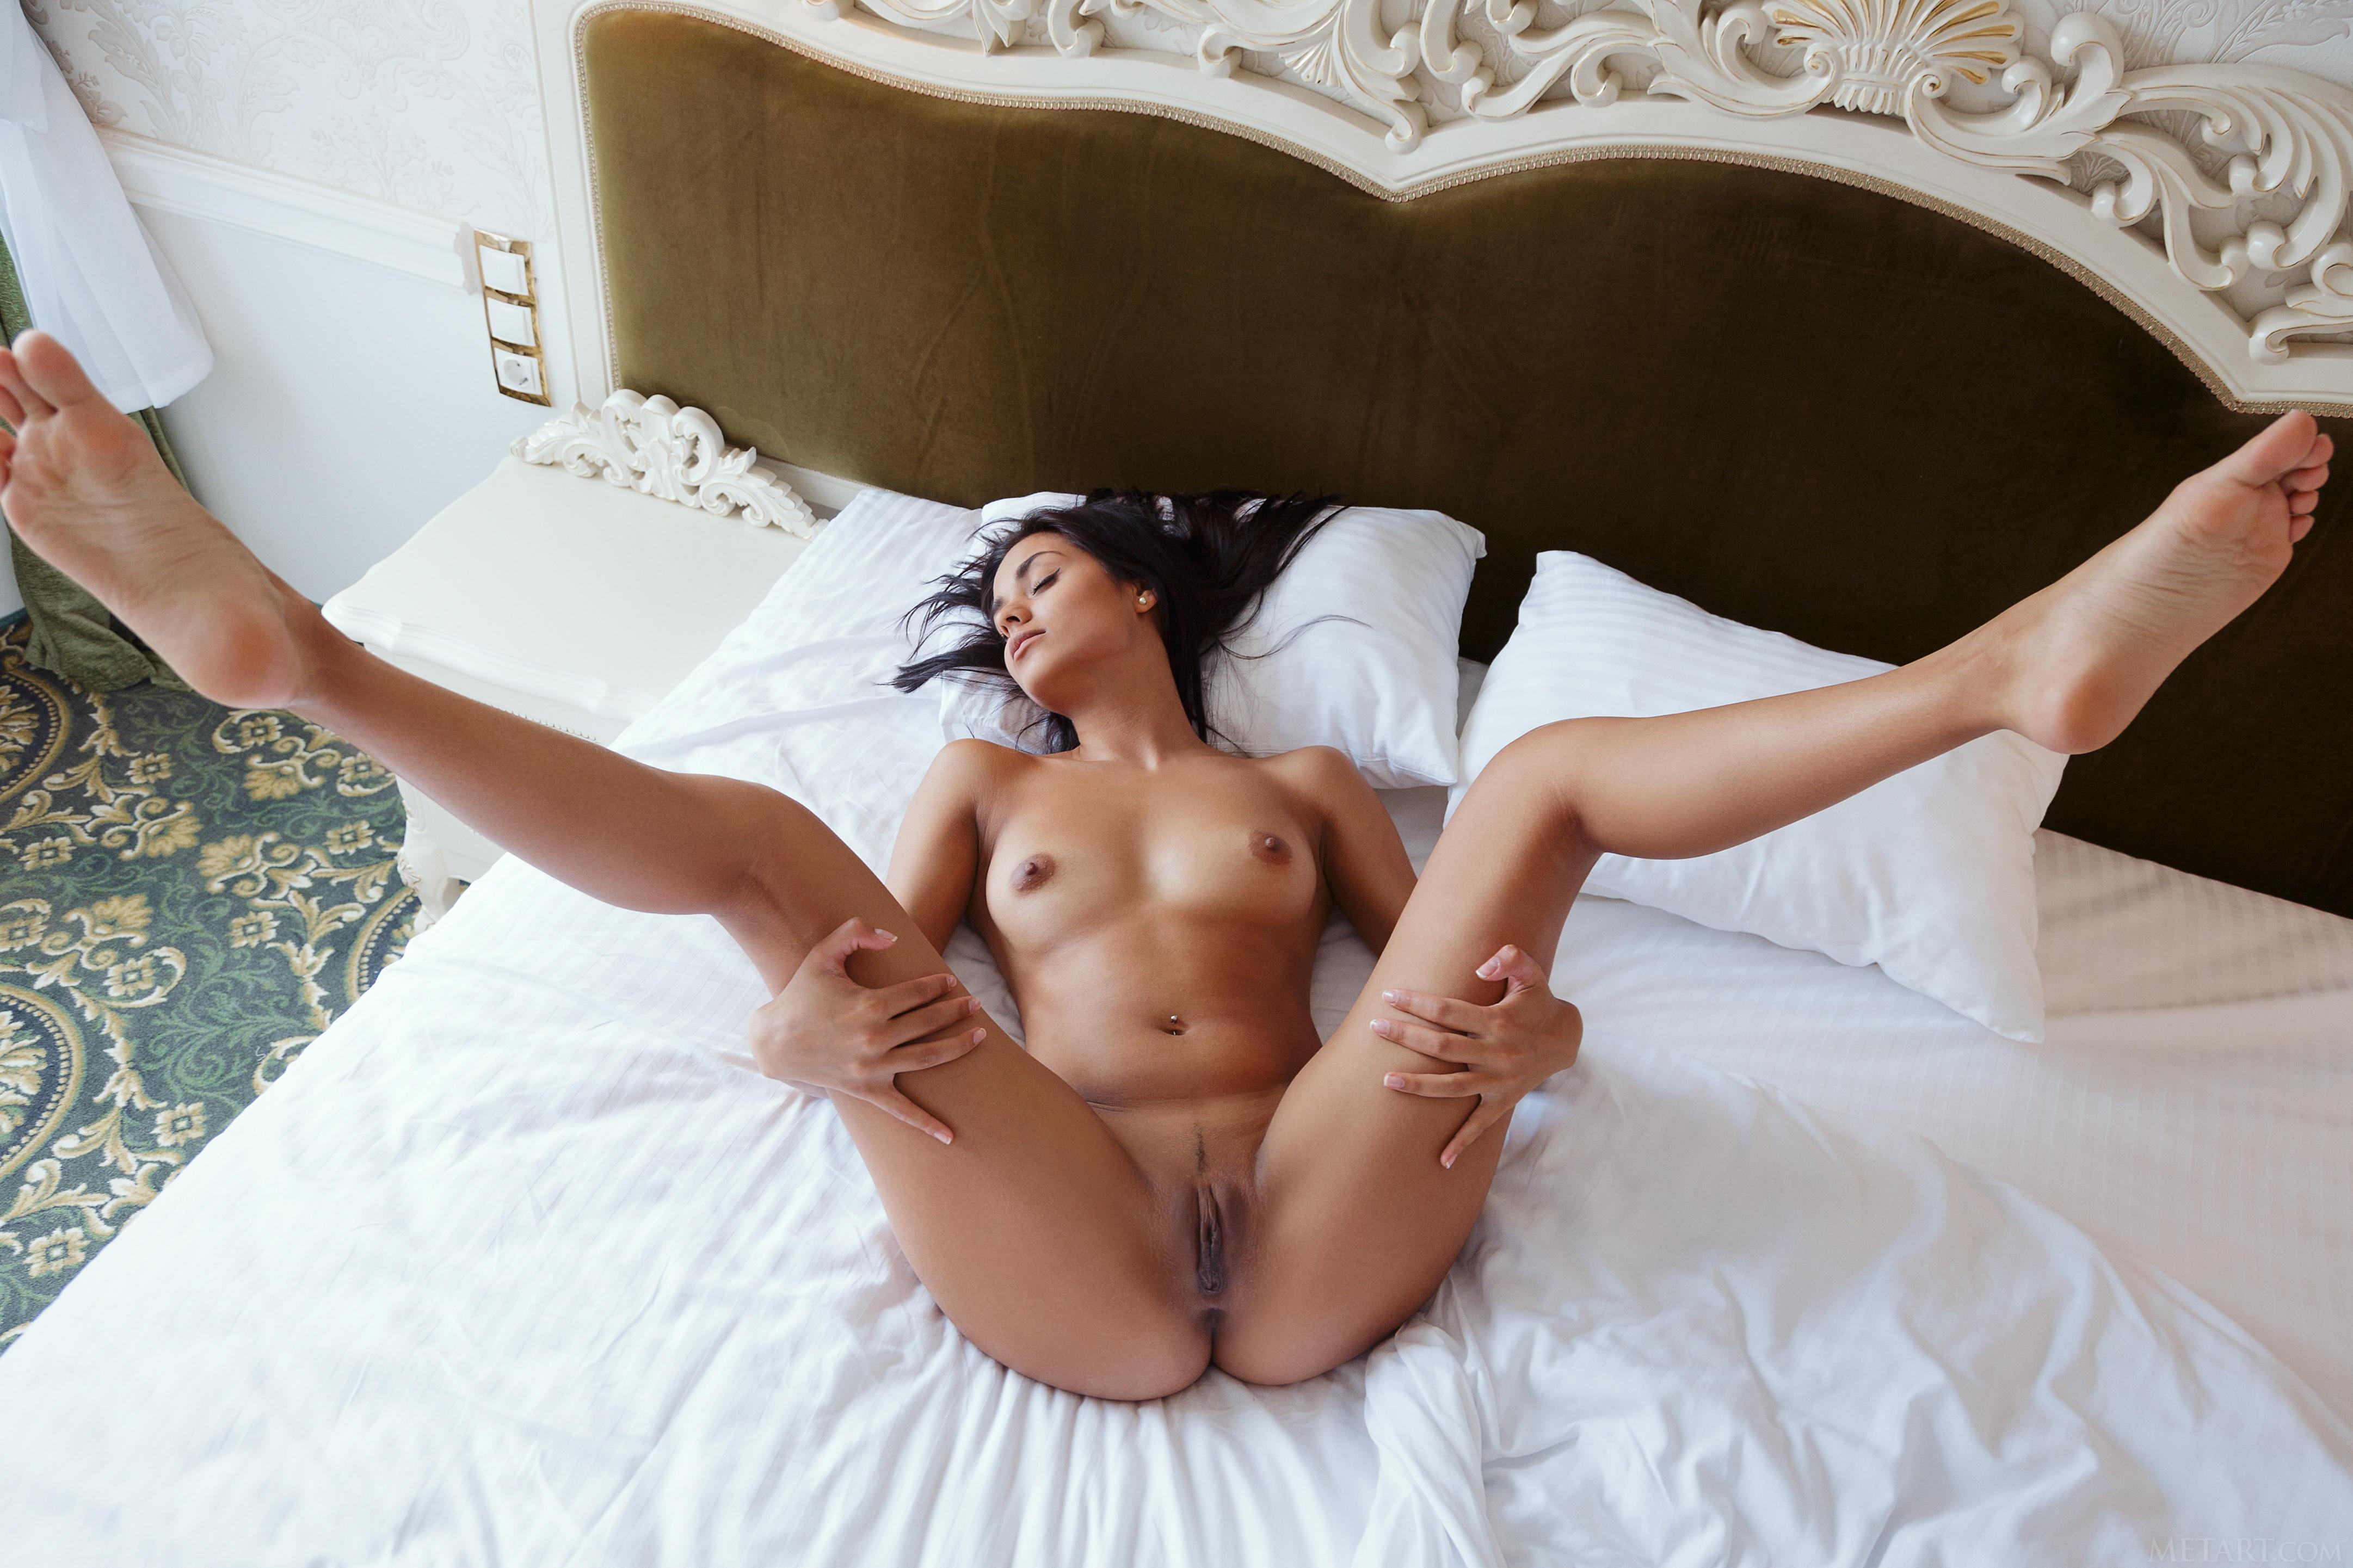 famous women caught nude